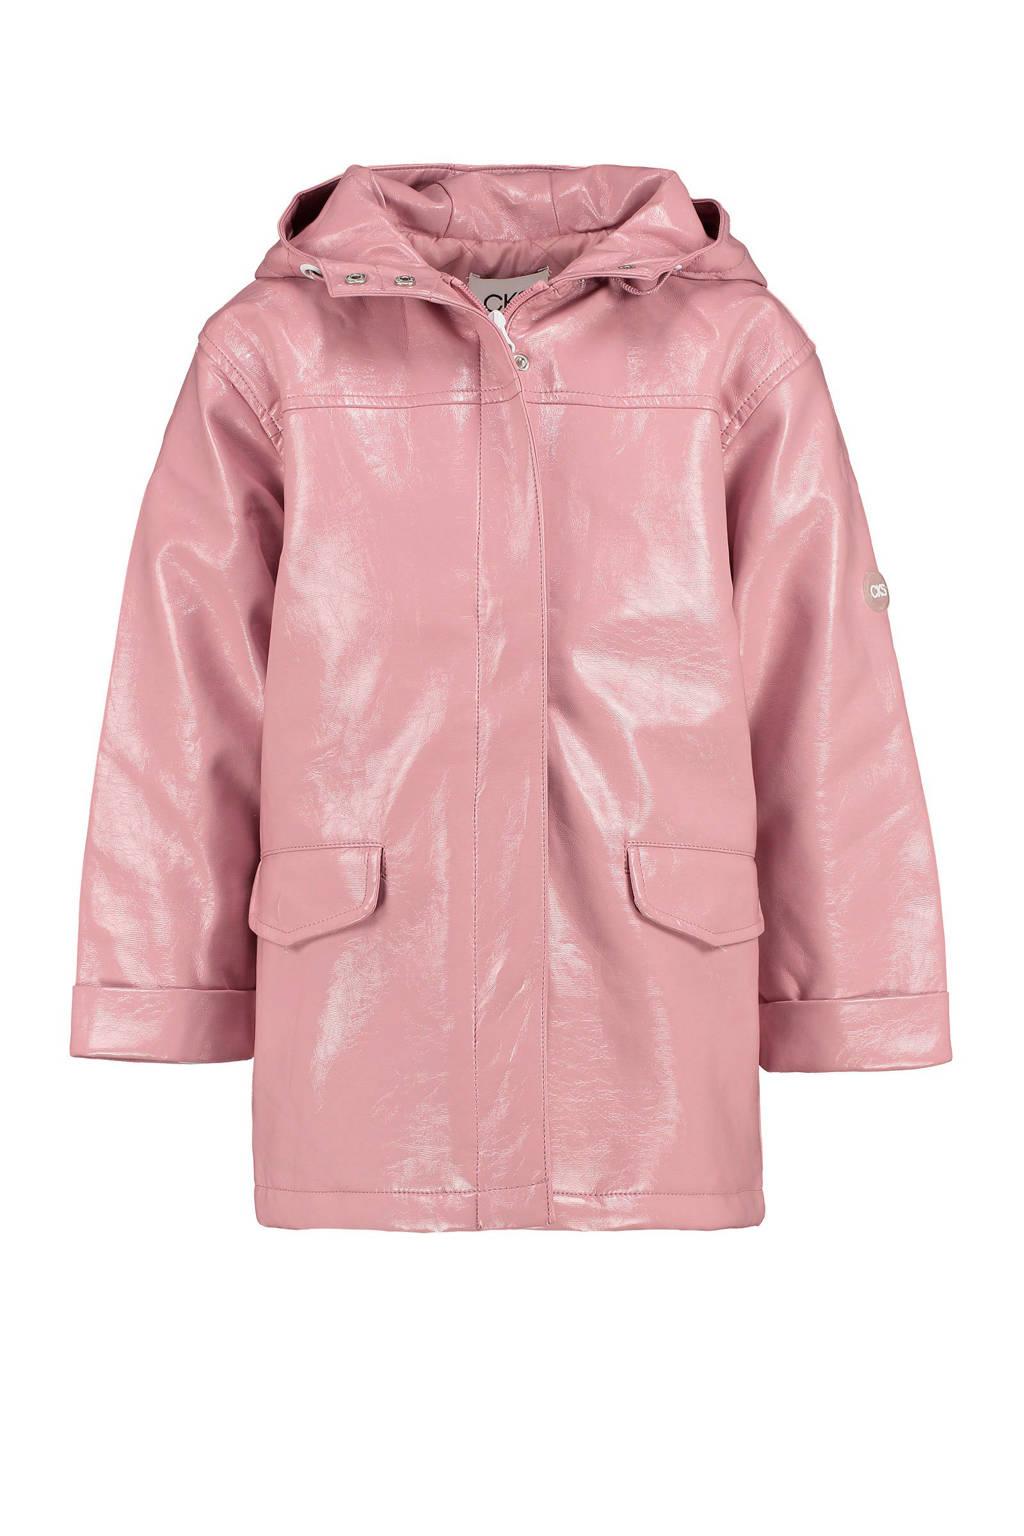 CKS KIDS jas Gwendy roze, Roze